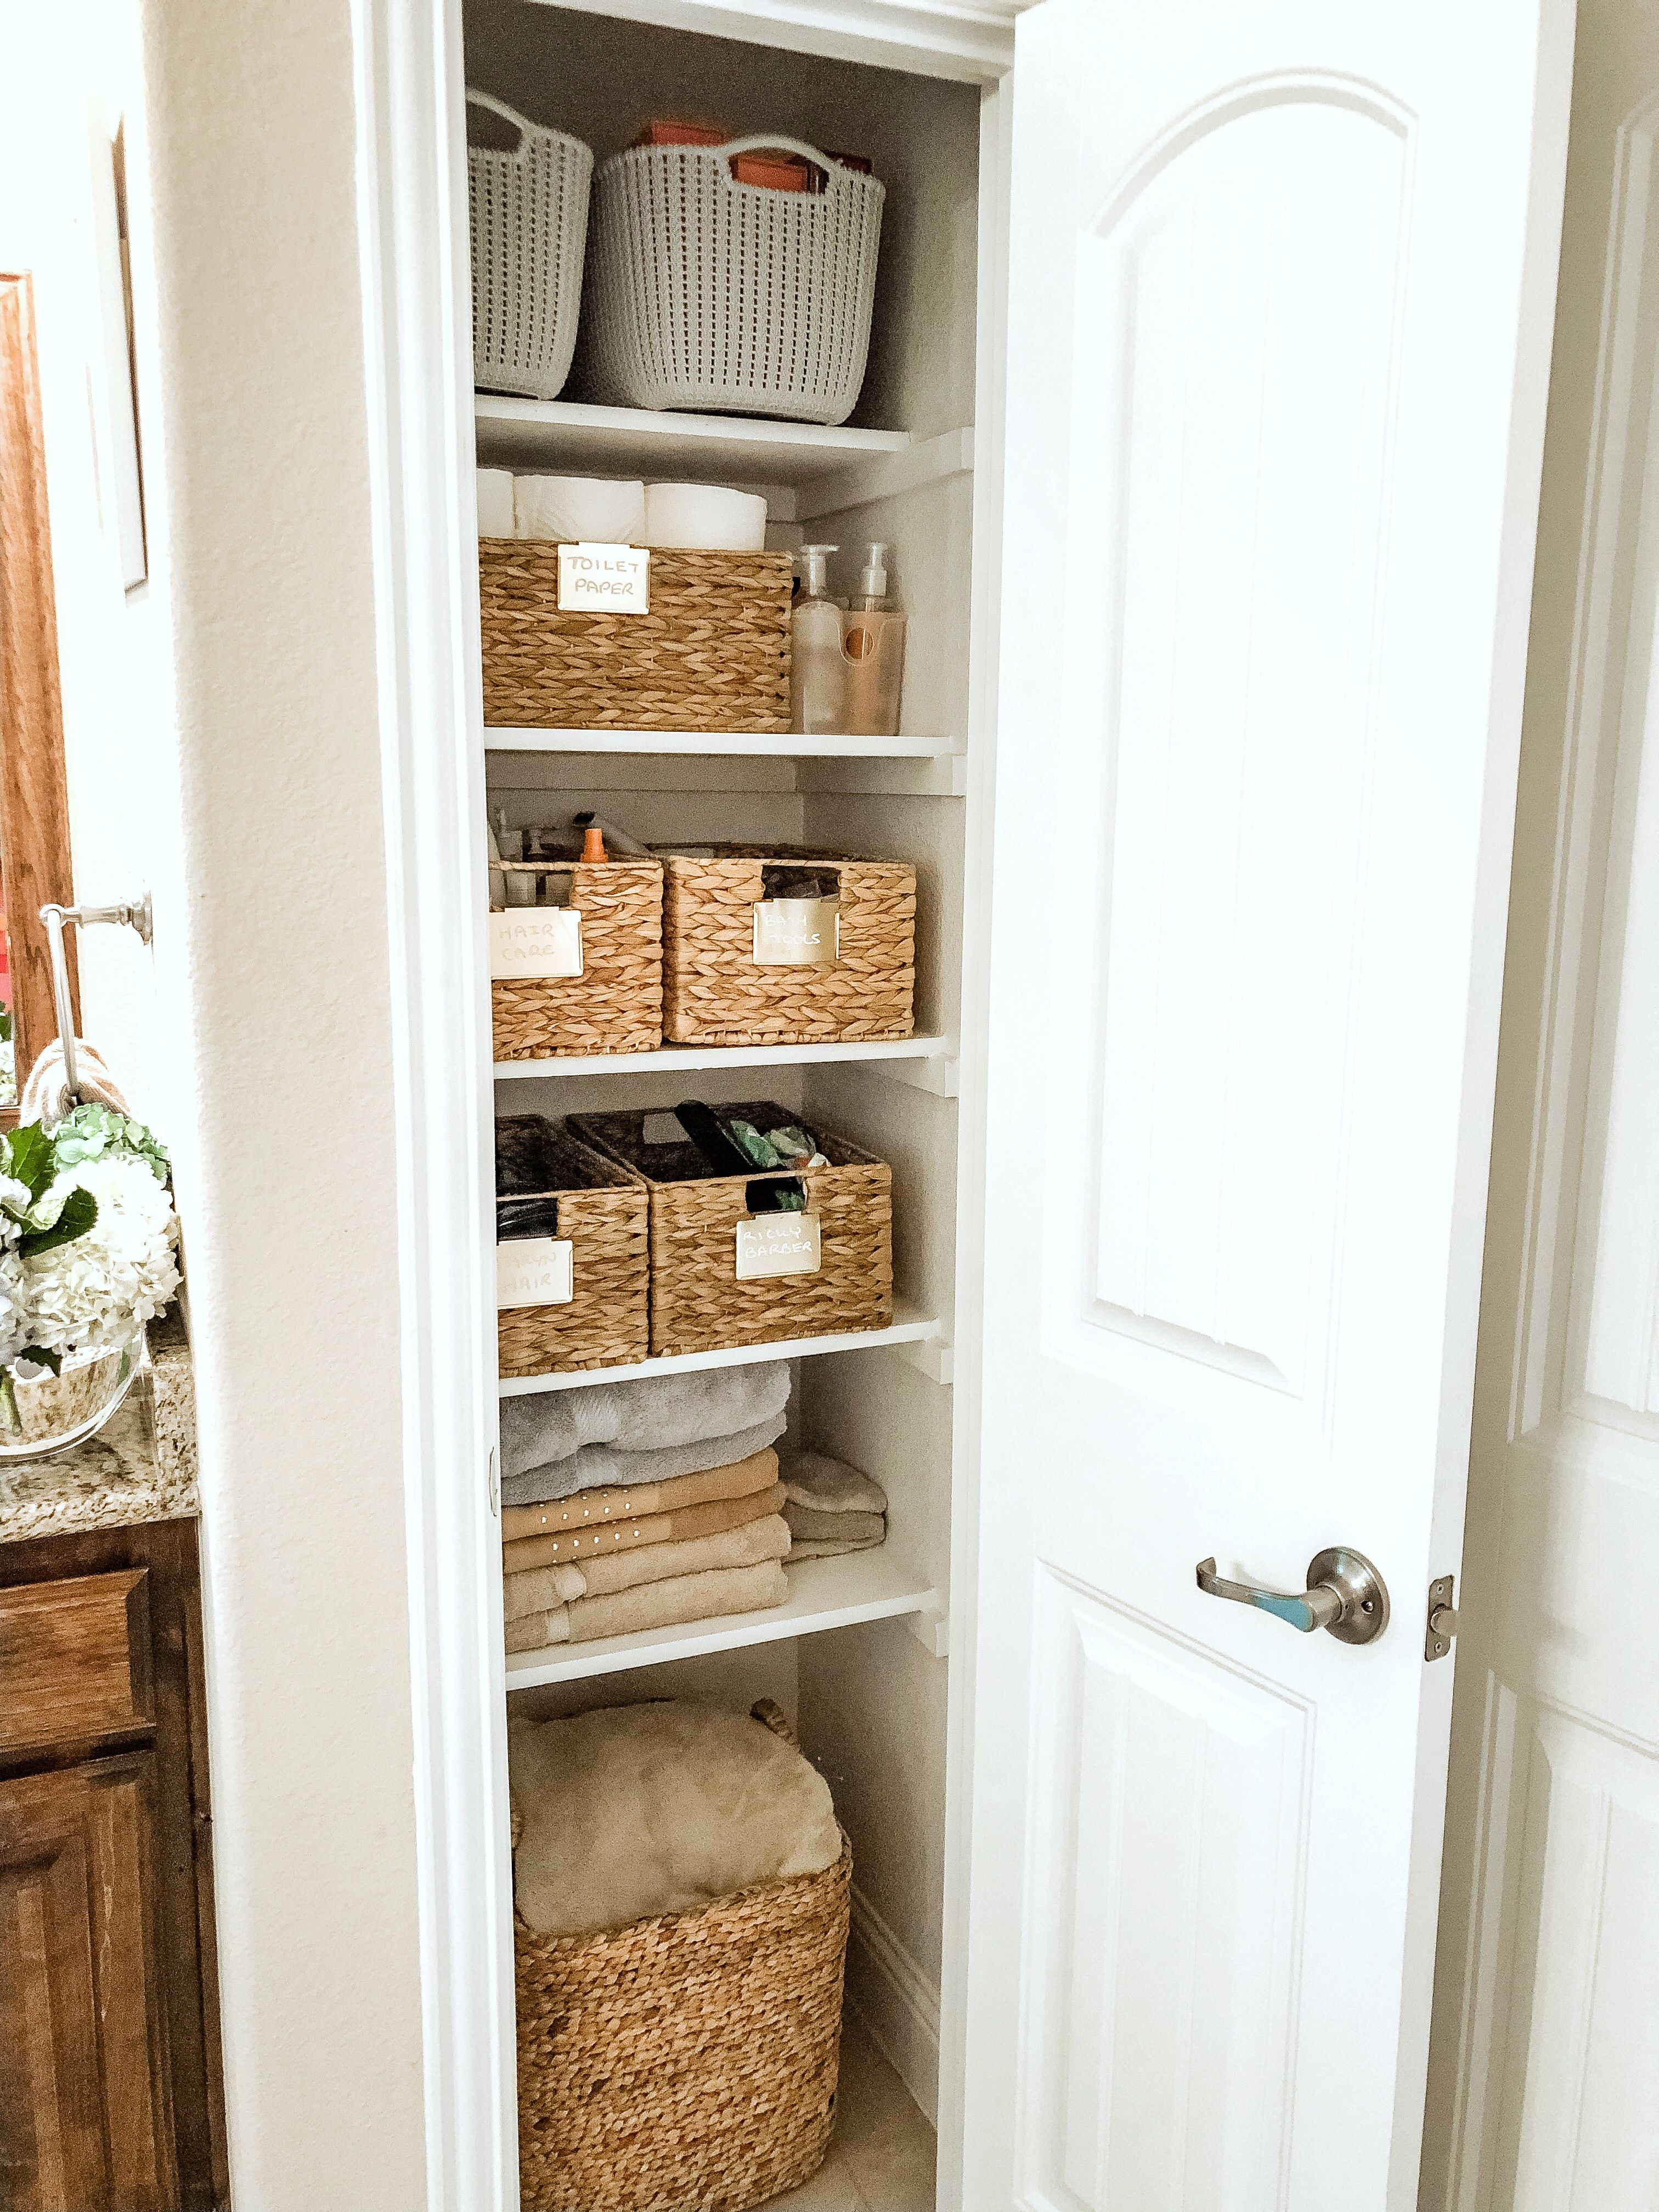 5 Steps To Organize Your Linen Closet Glamorous Versatility Bathroom Linen Closet Linen Closet Design Linen Closet